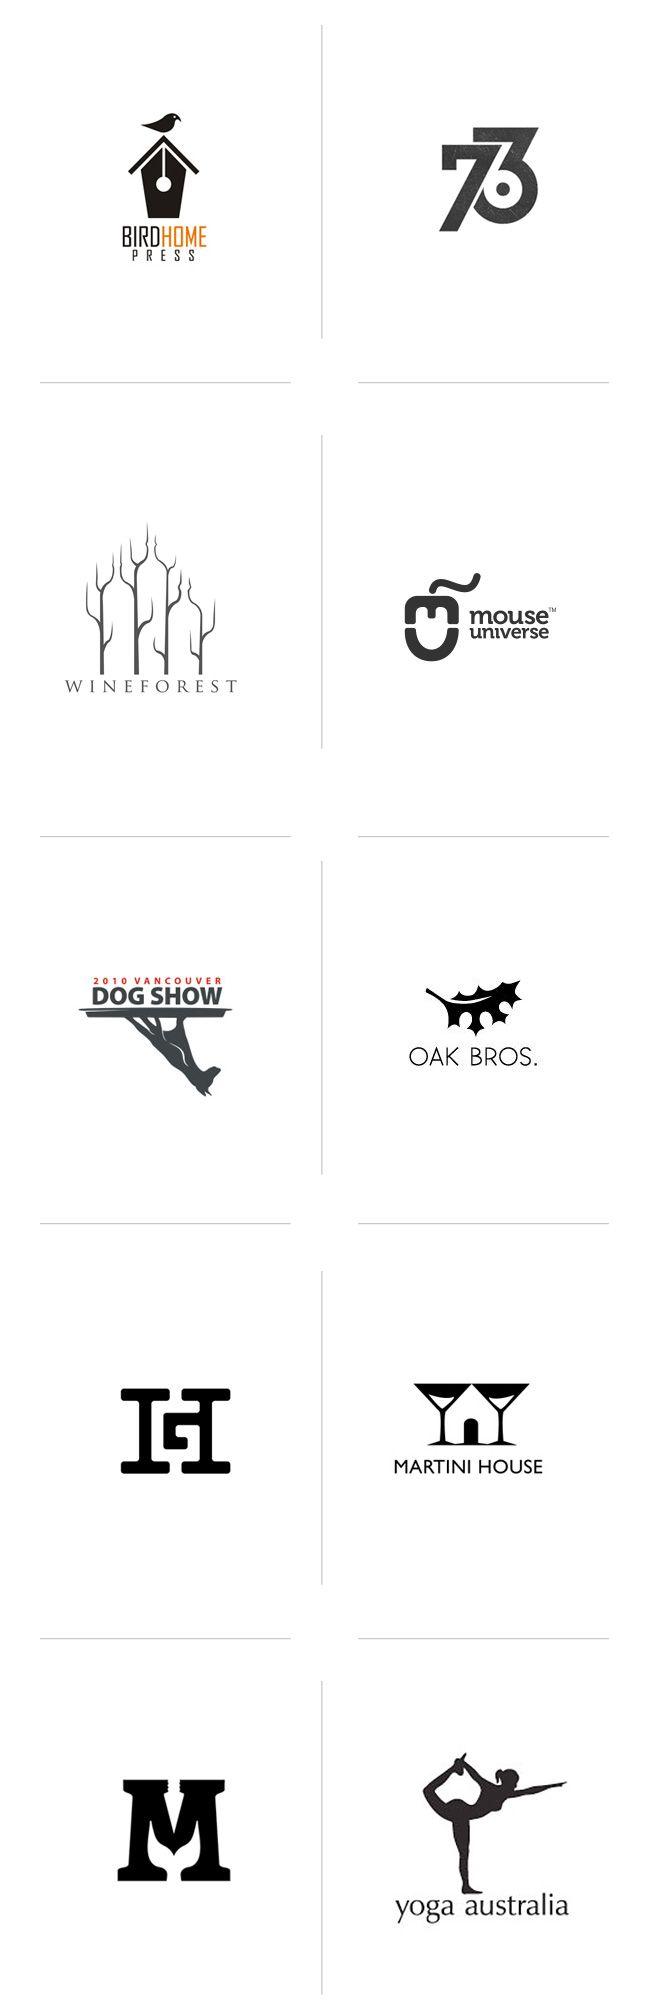 Negative space logos we love | http://www.slickfish.com/logo-design/logos-use-negative-space